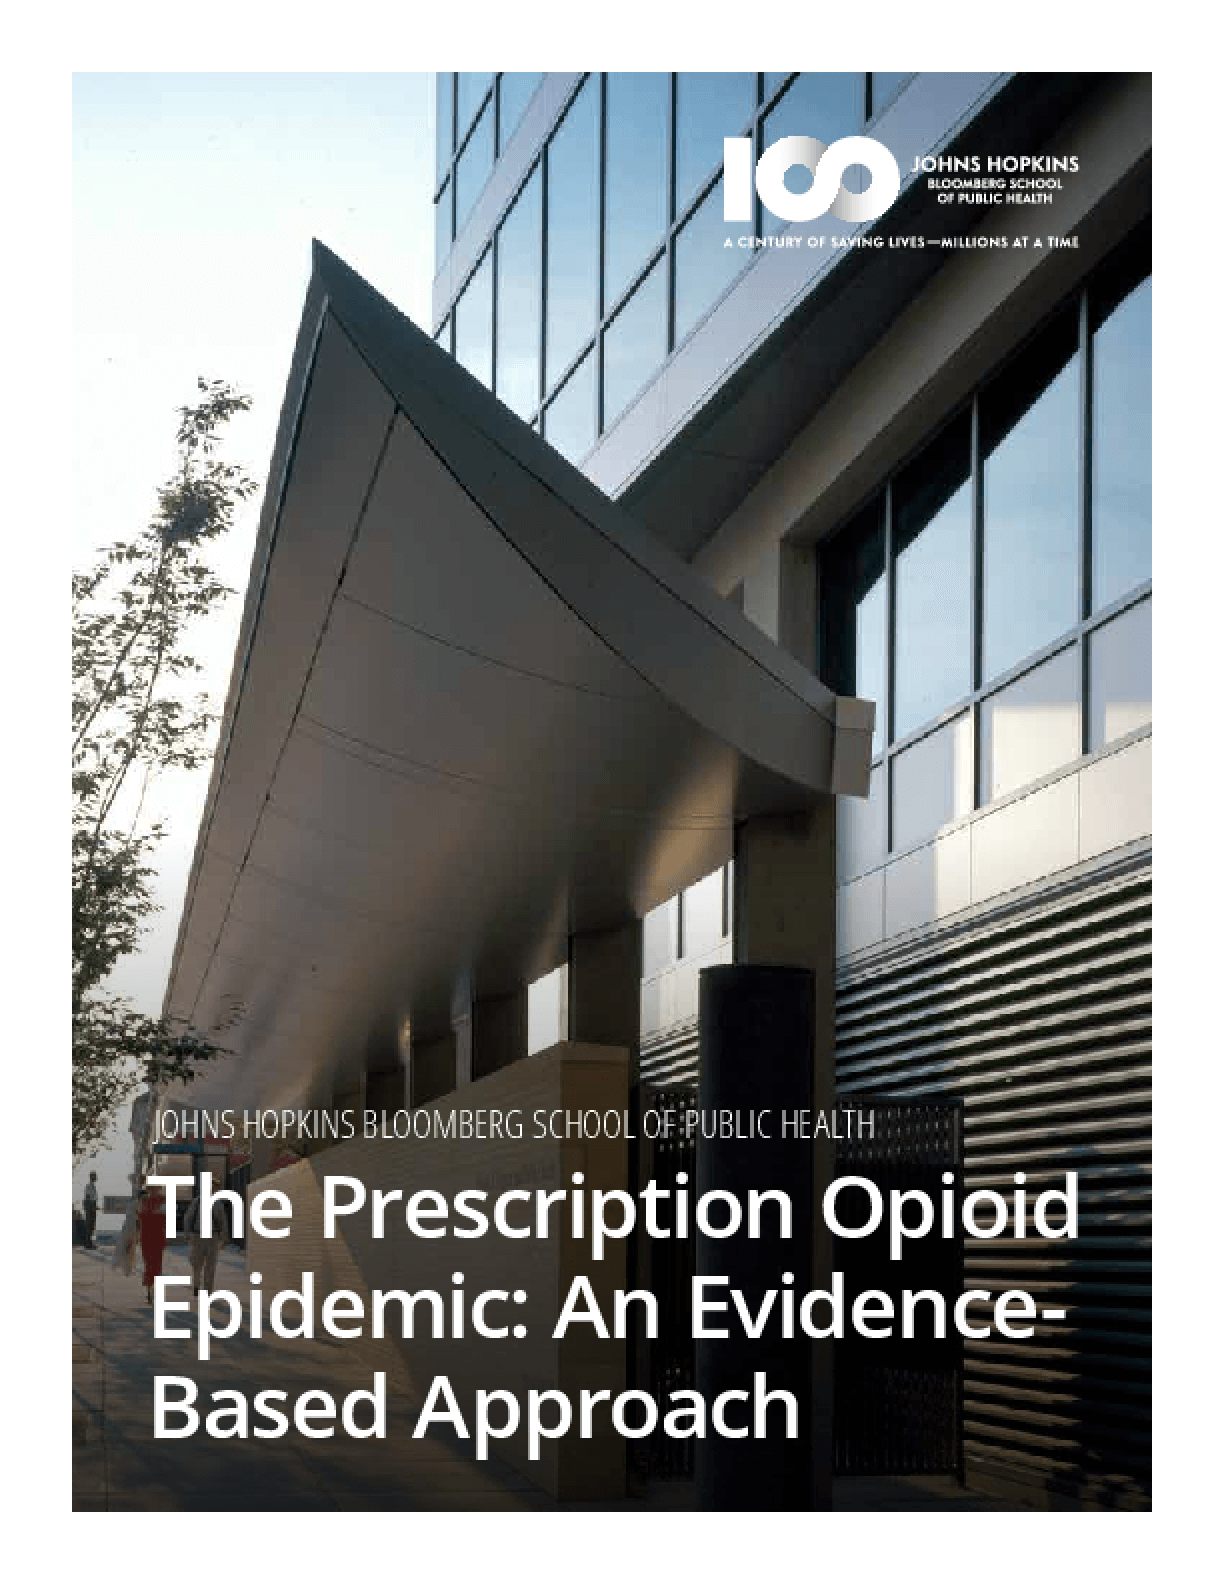 The Prescription Opioid Epidemic: an Evidence-Based Approach